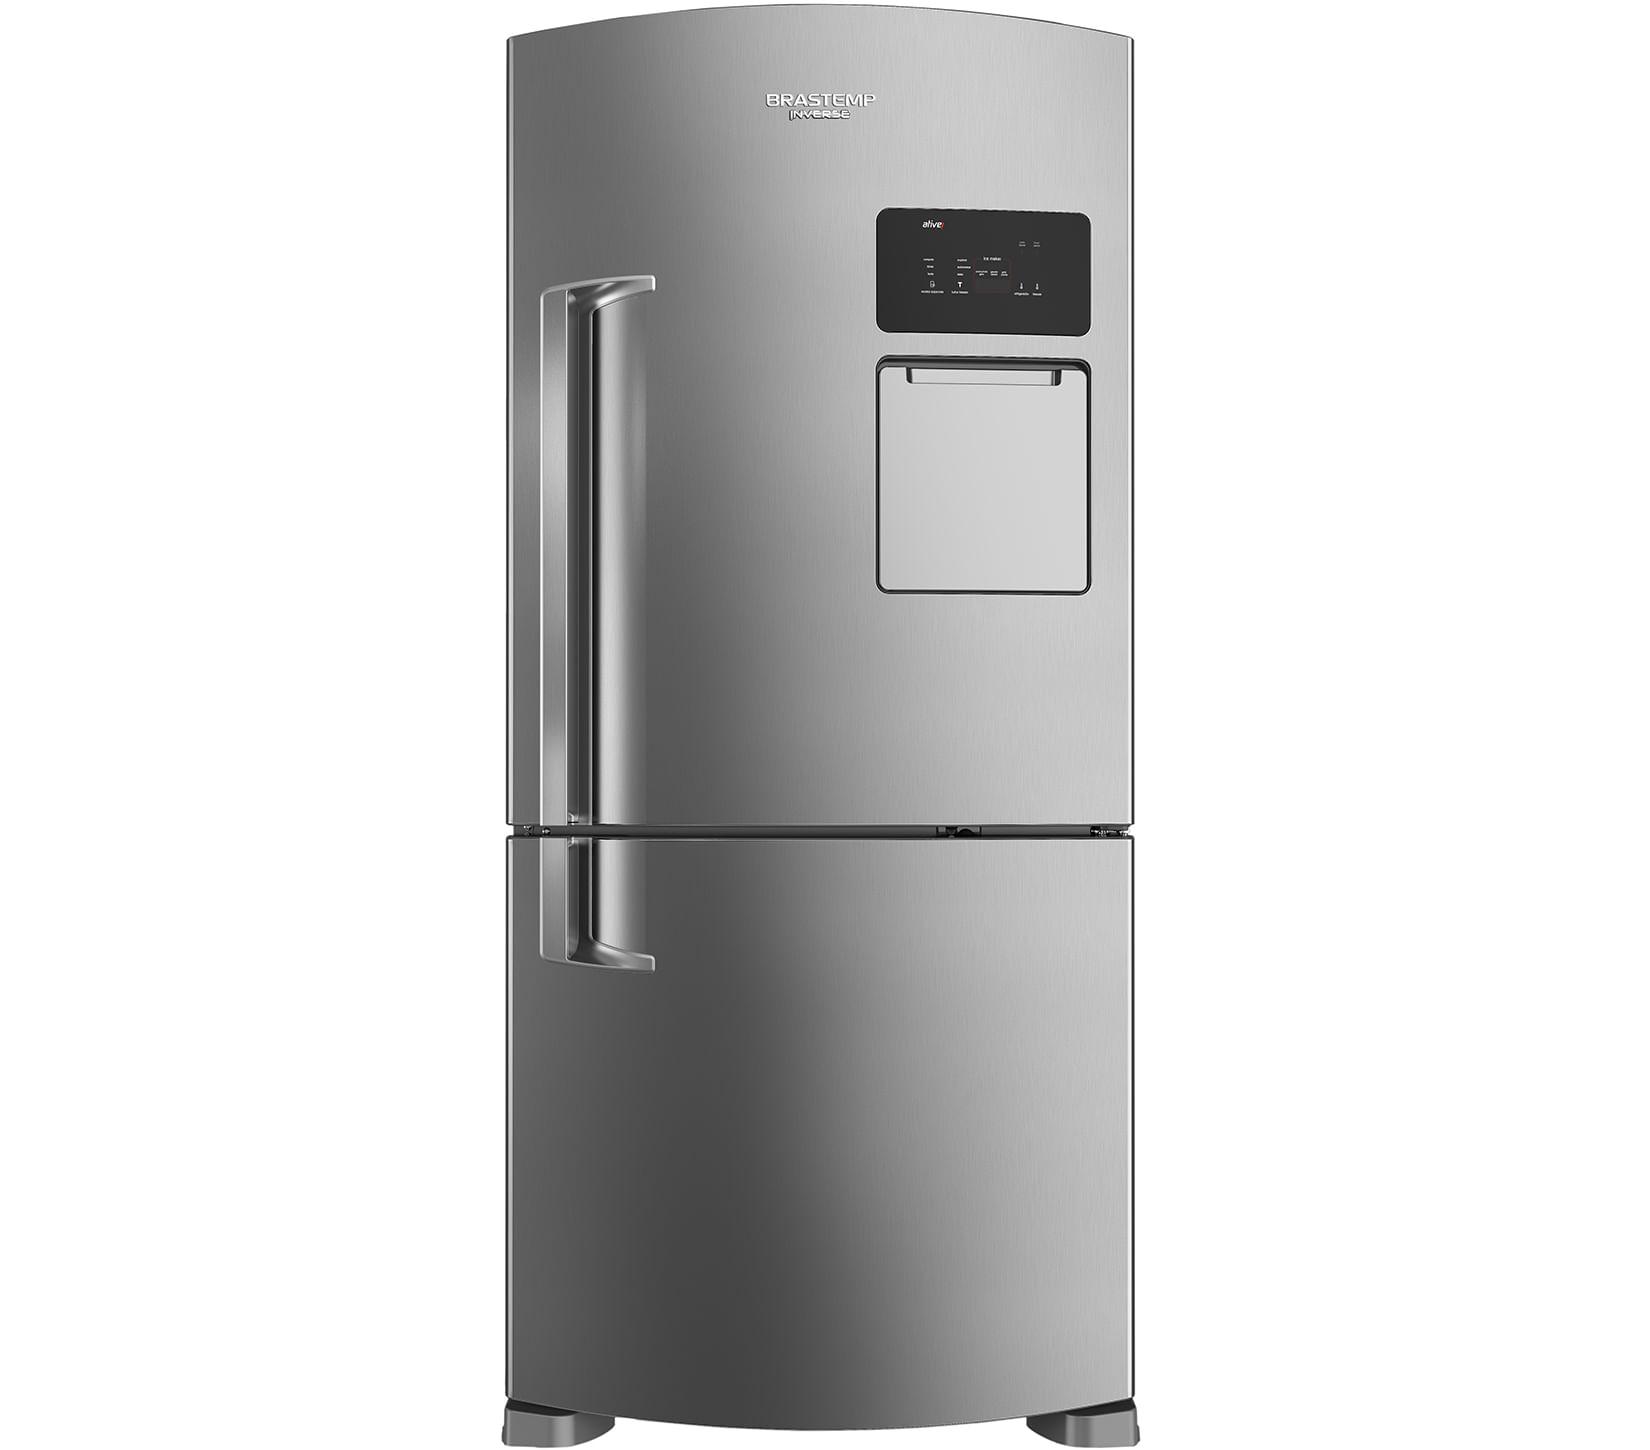 Geladeira Brastemp Frost Free Inverse 565 litros cor Inox com Ice Maker